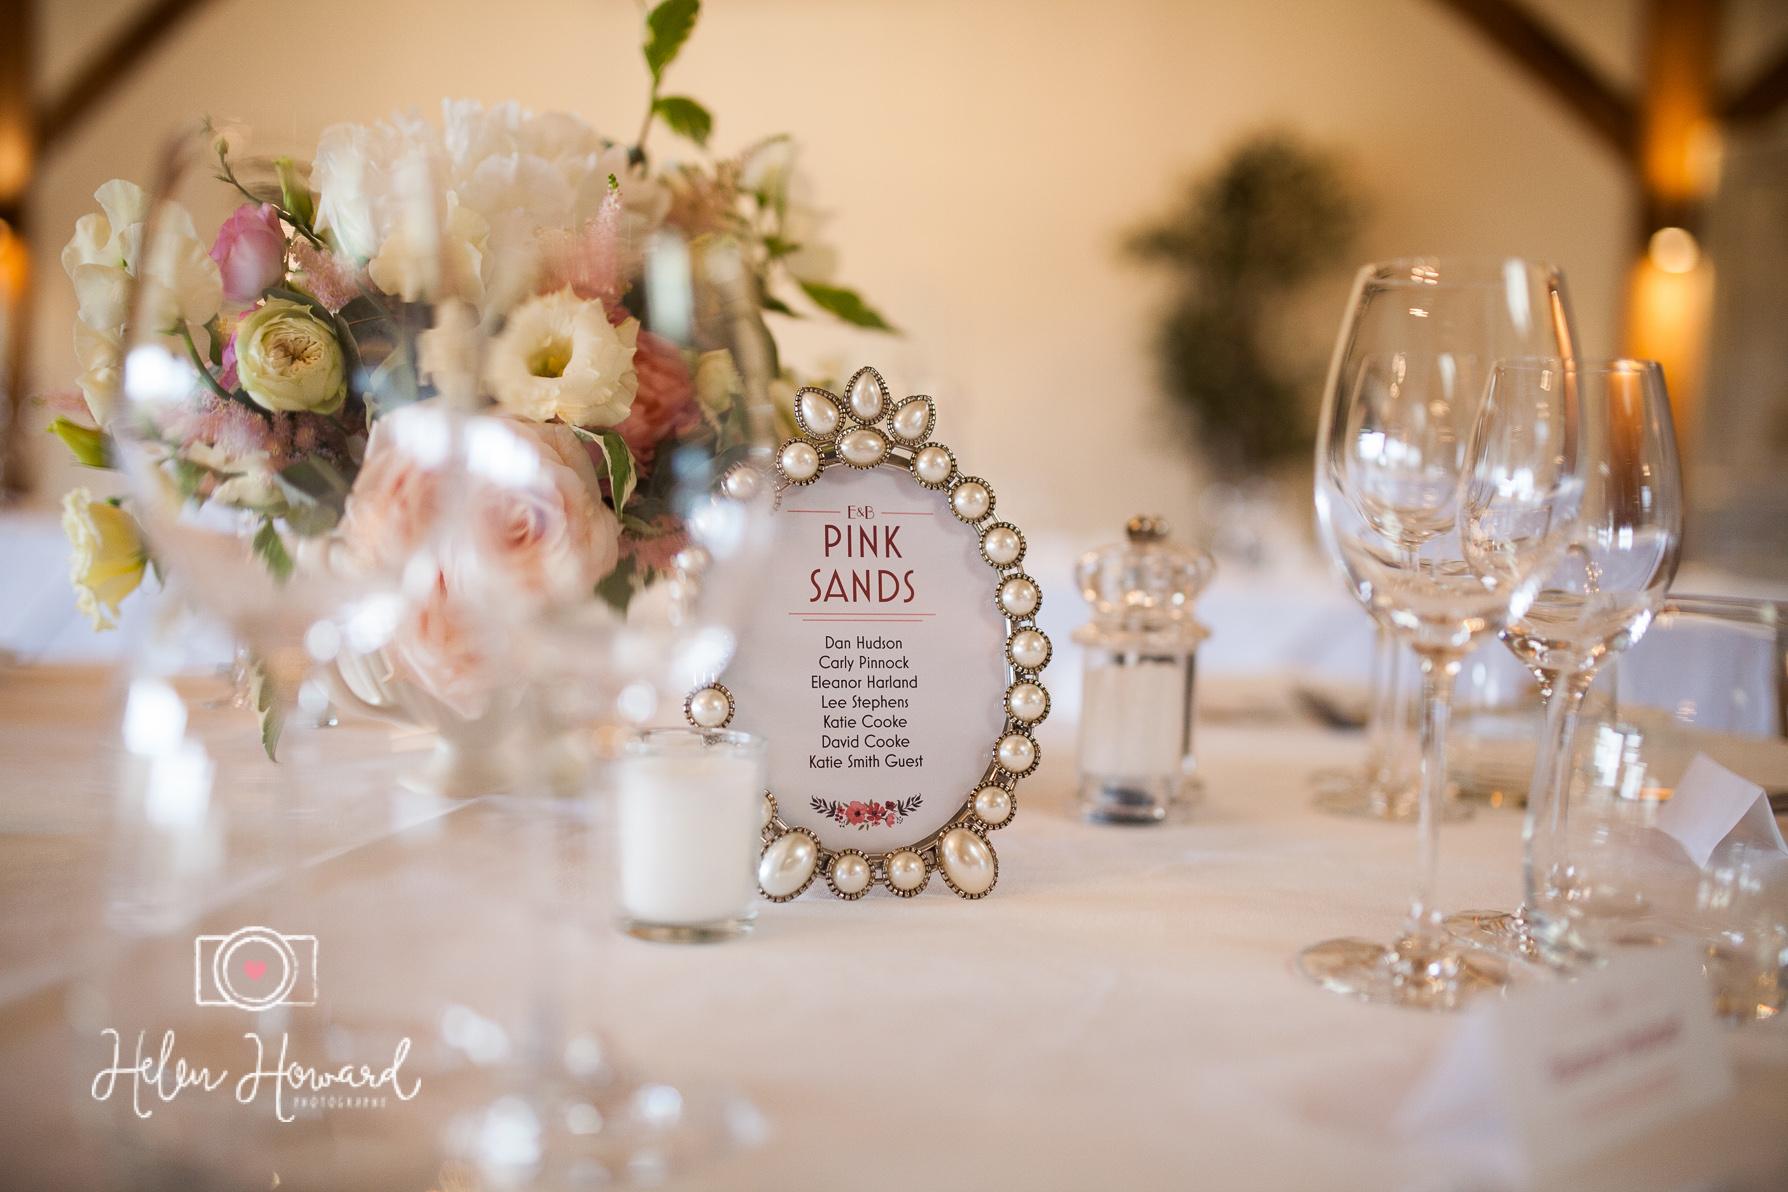 Helen Howard Photography Packington Moor Wedding-27.jpg